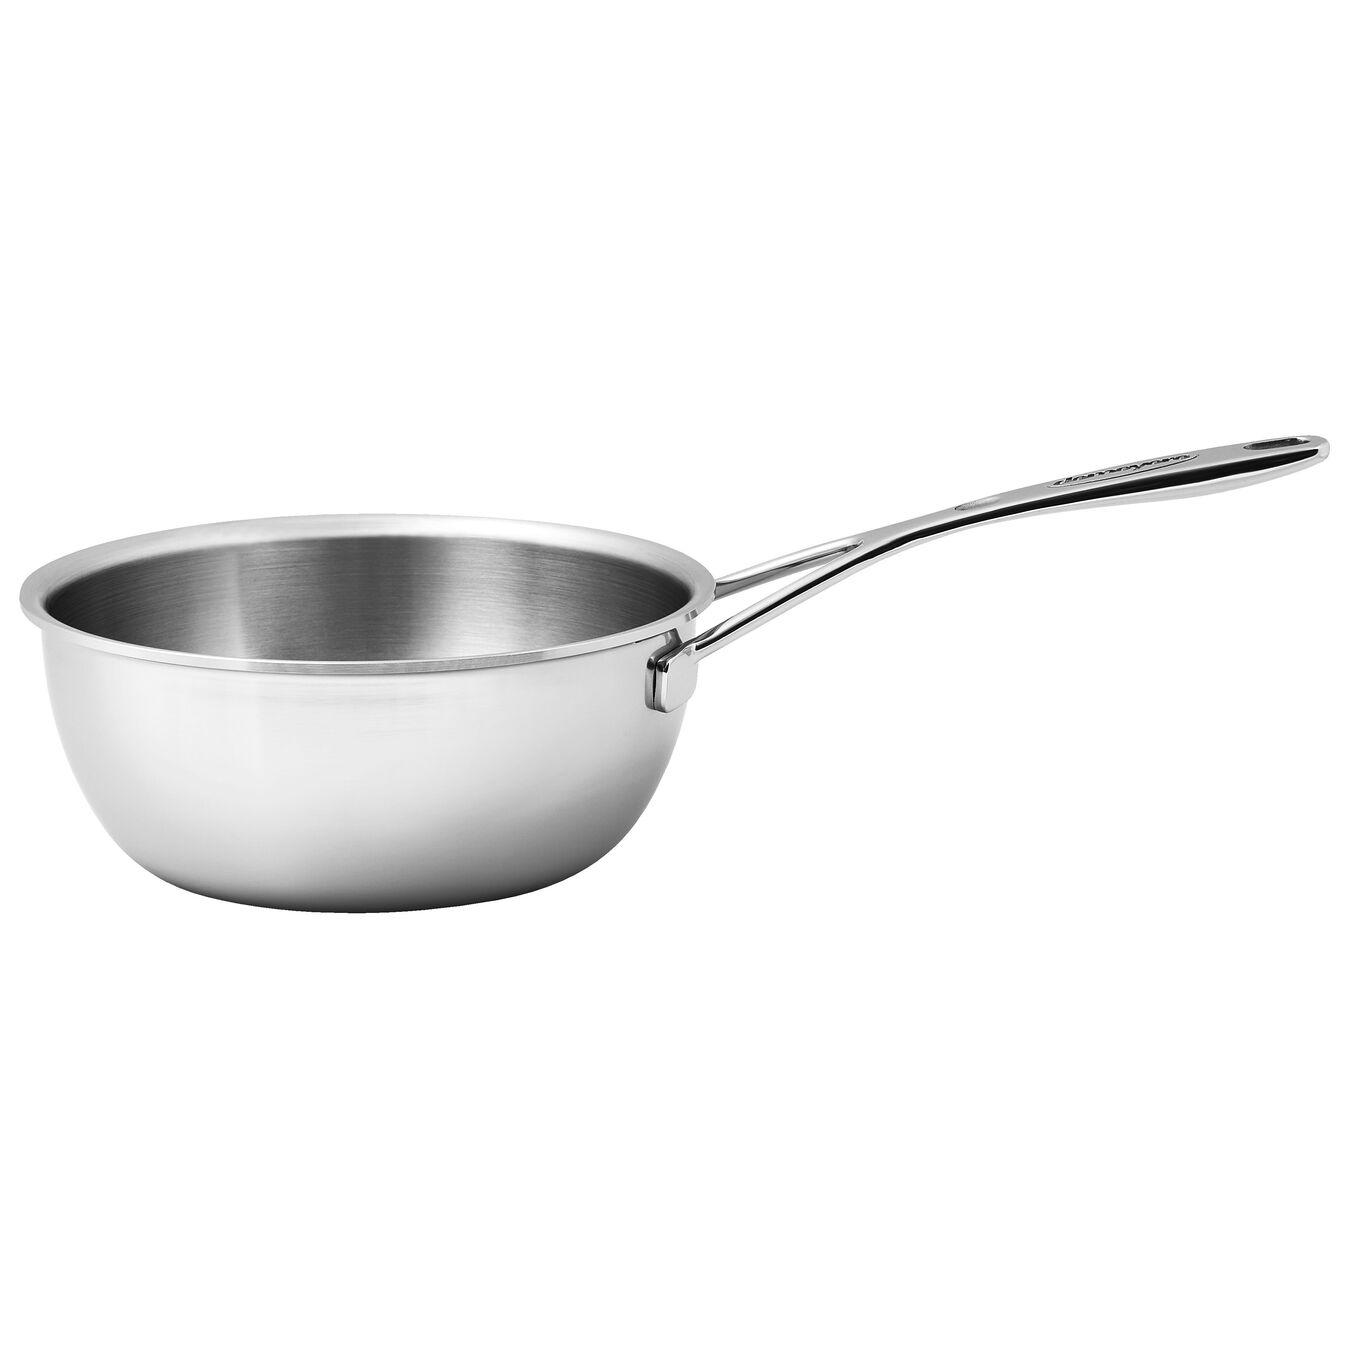 Sauteuse, 60.00 floz | Stainless steel,,large 1